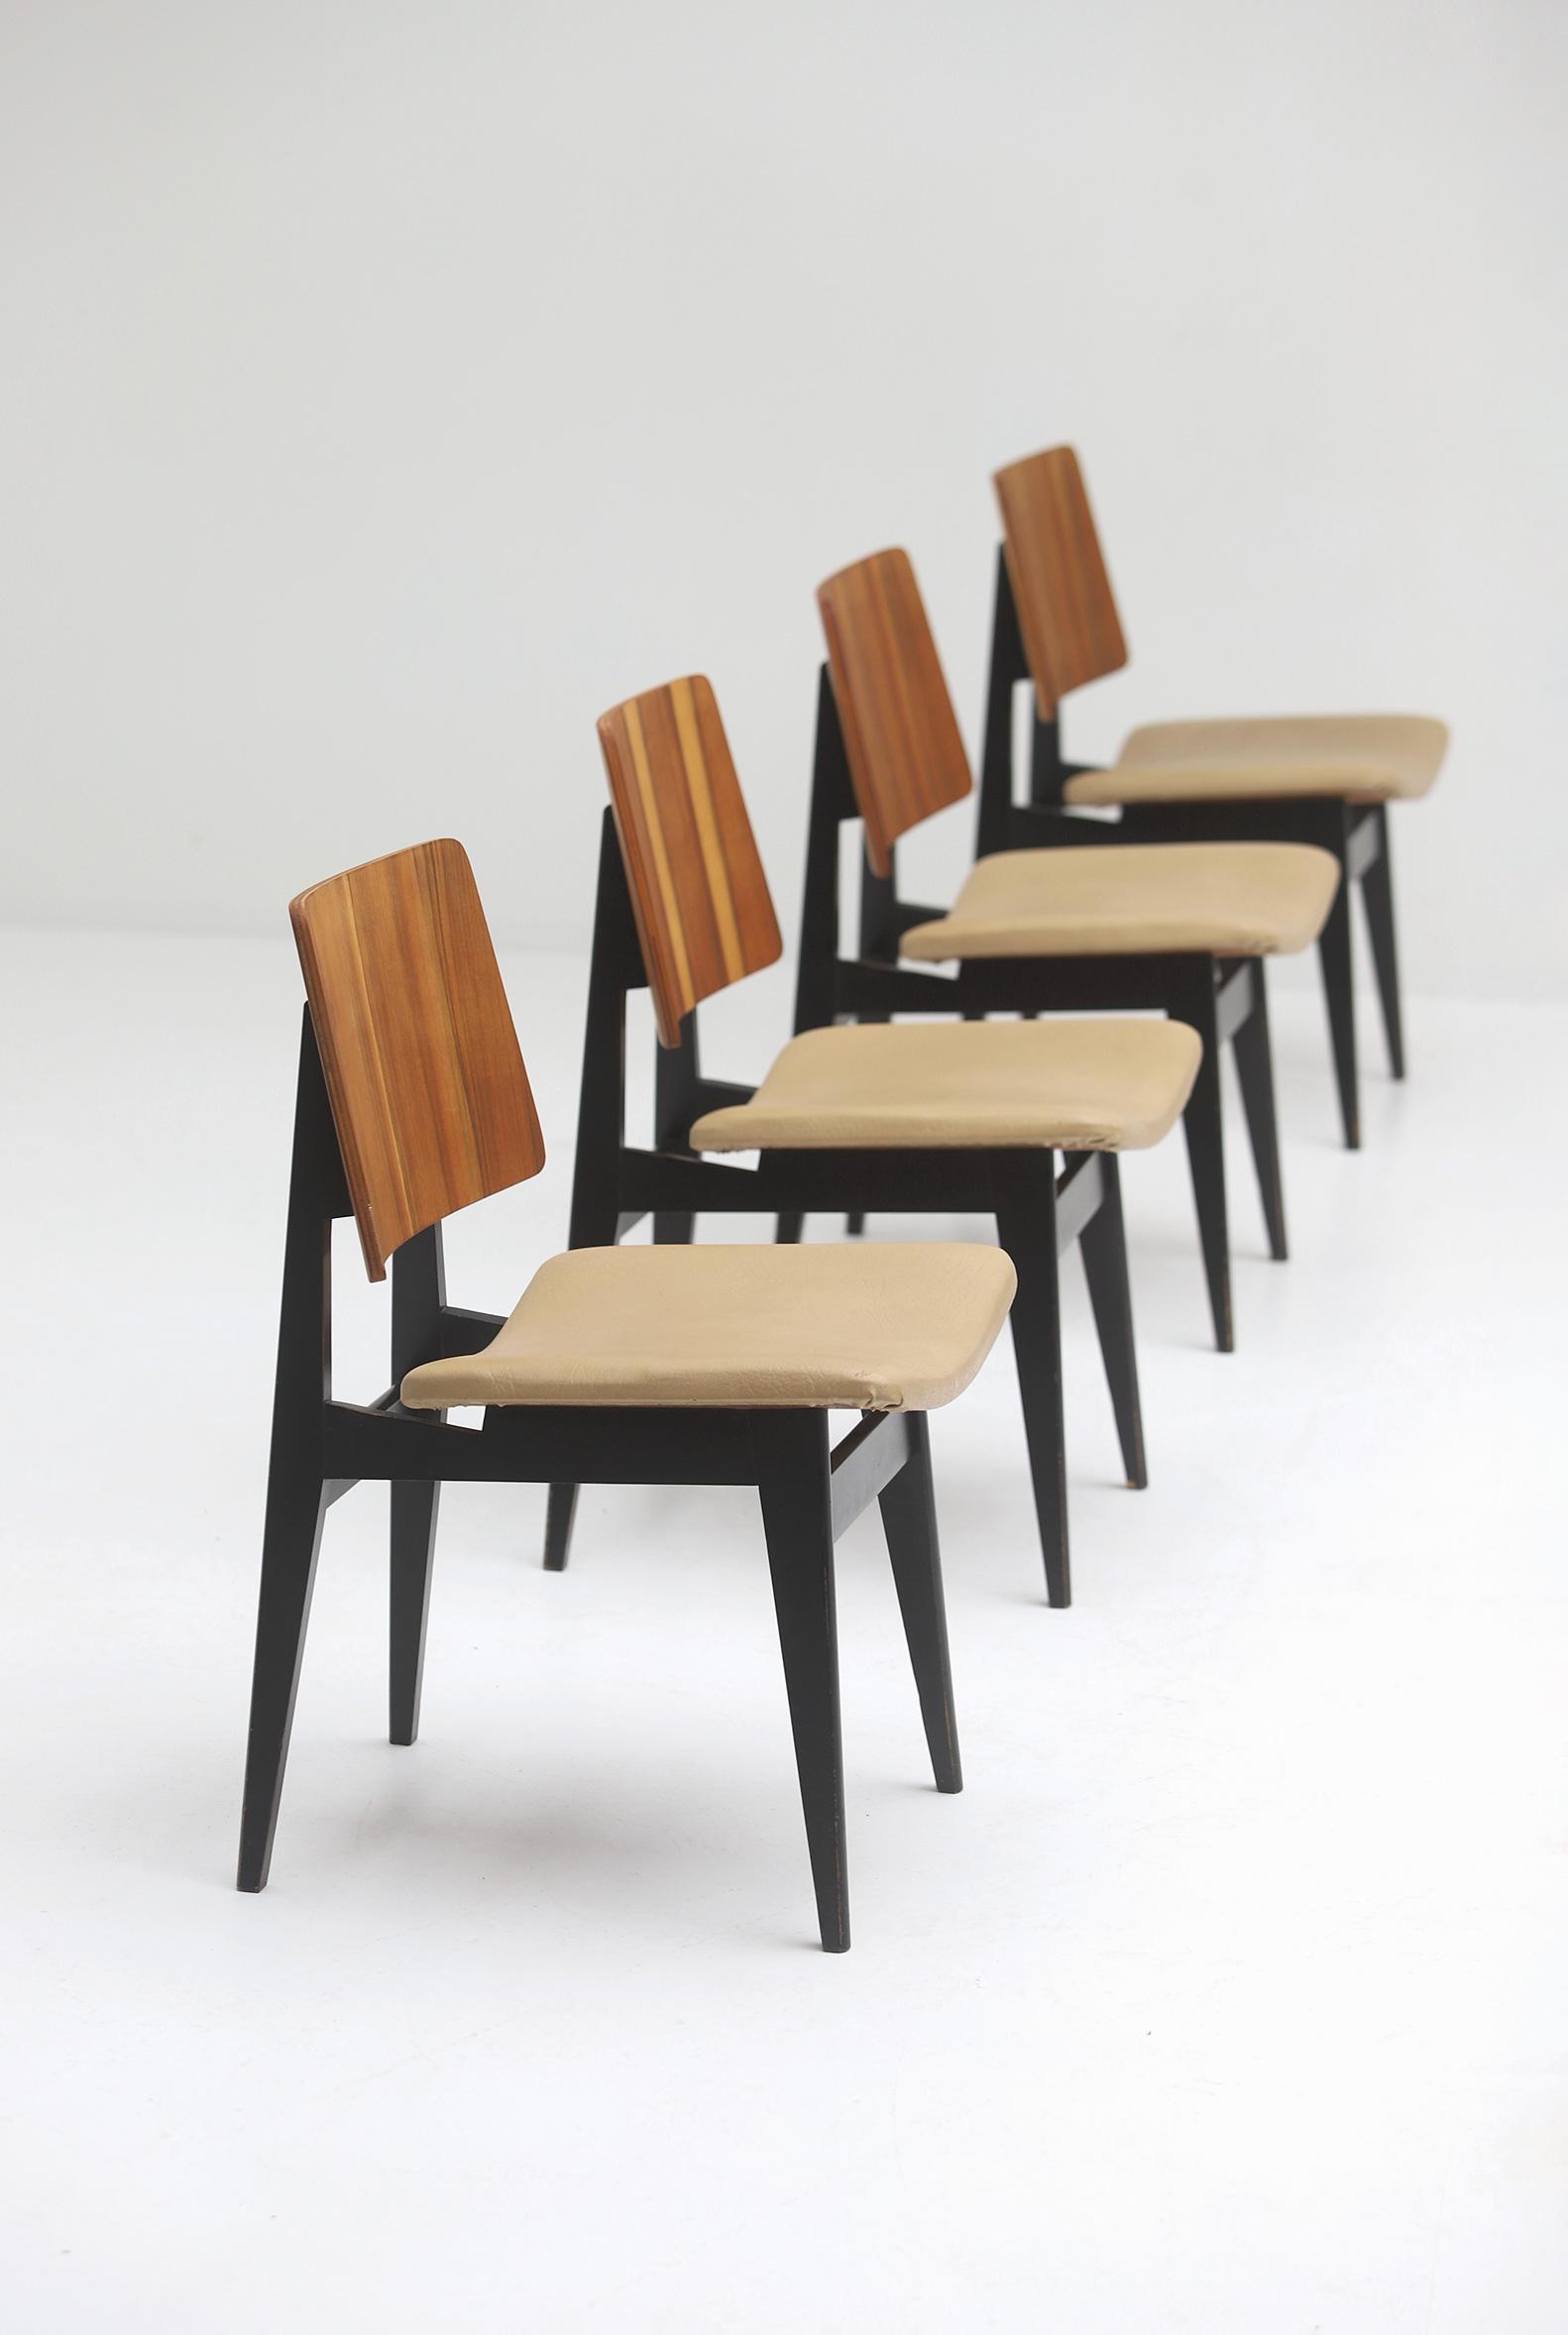 Luxus Jos De Mey Dining Chairsimage 6